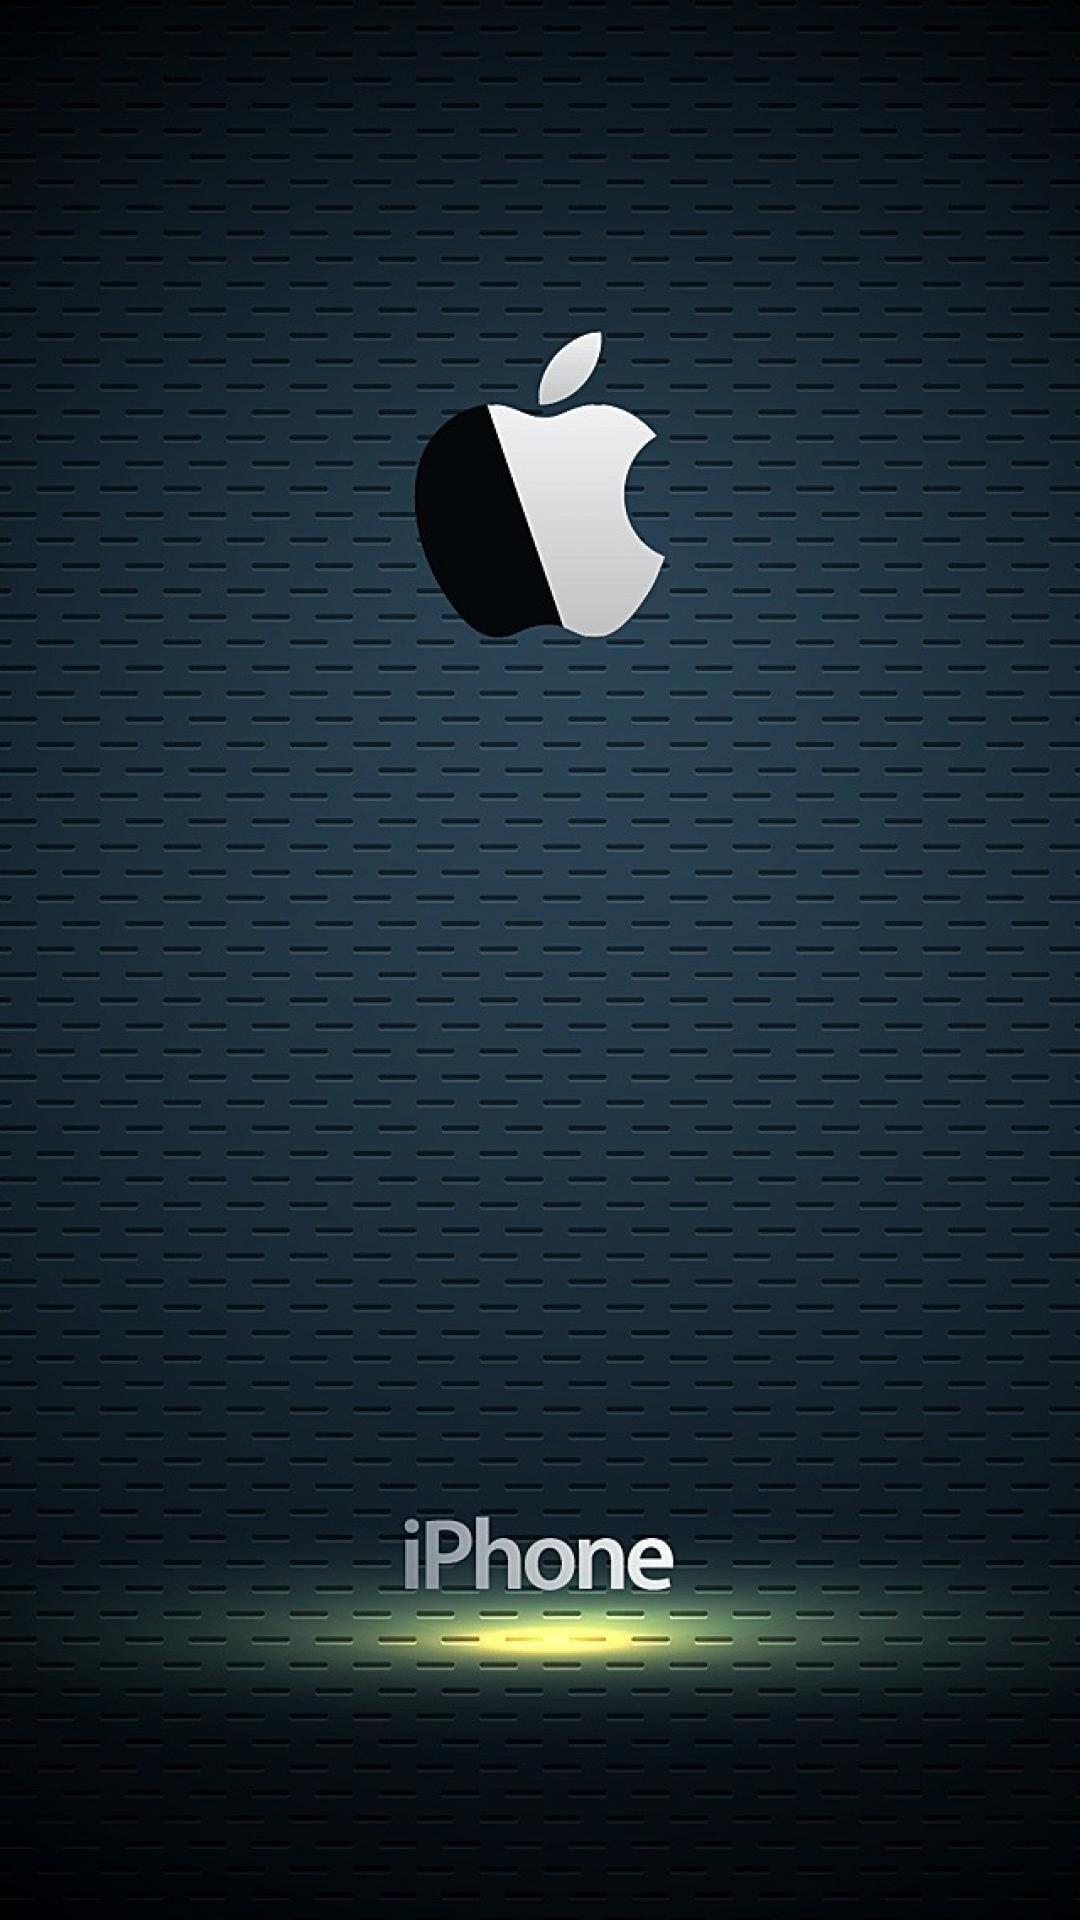 Logo hd wallpaper